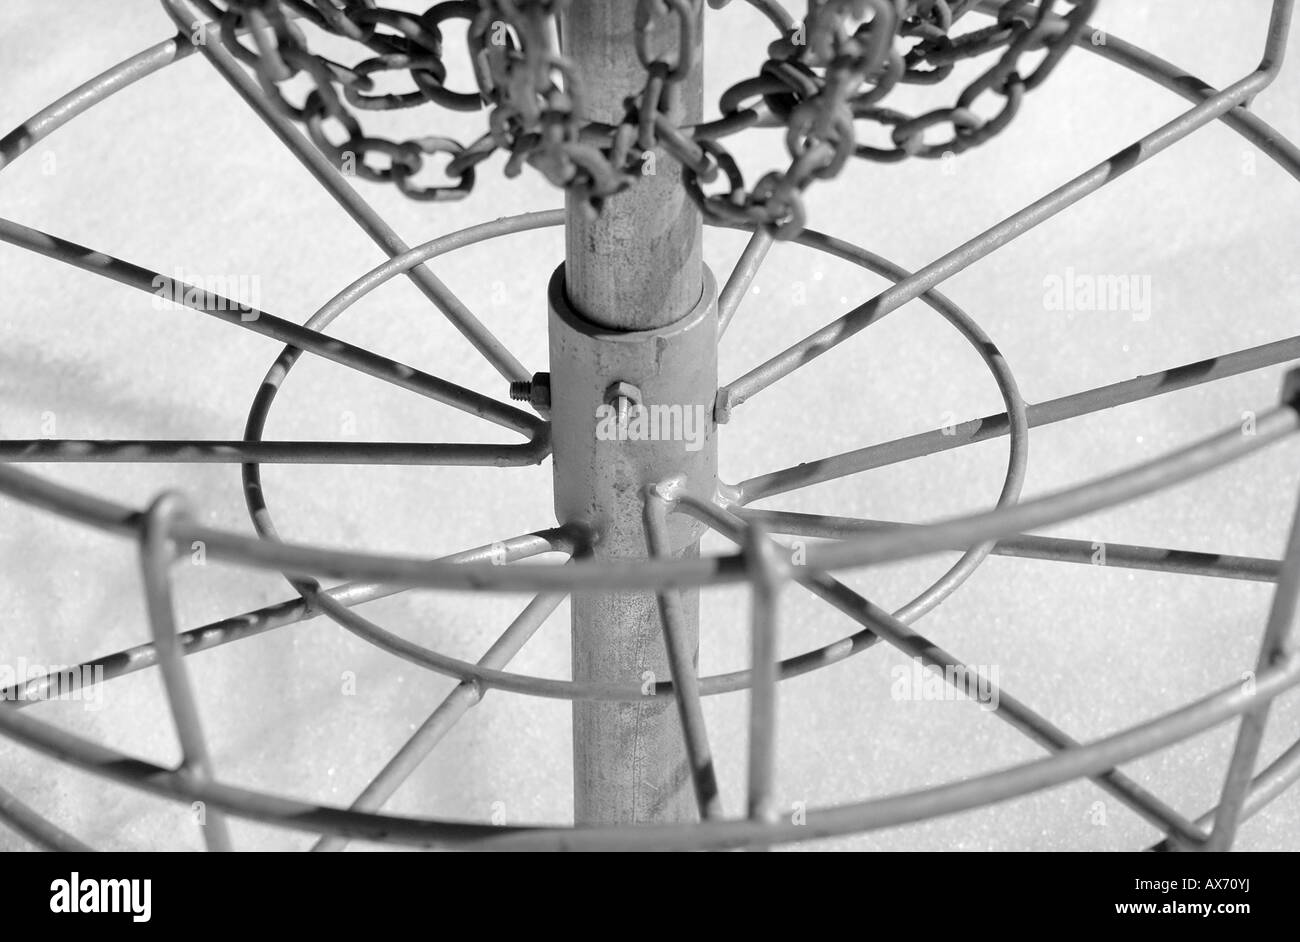 Wire Bin Stock Photos & Wire Bin Stock Images - Alamy